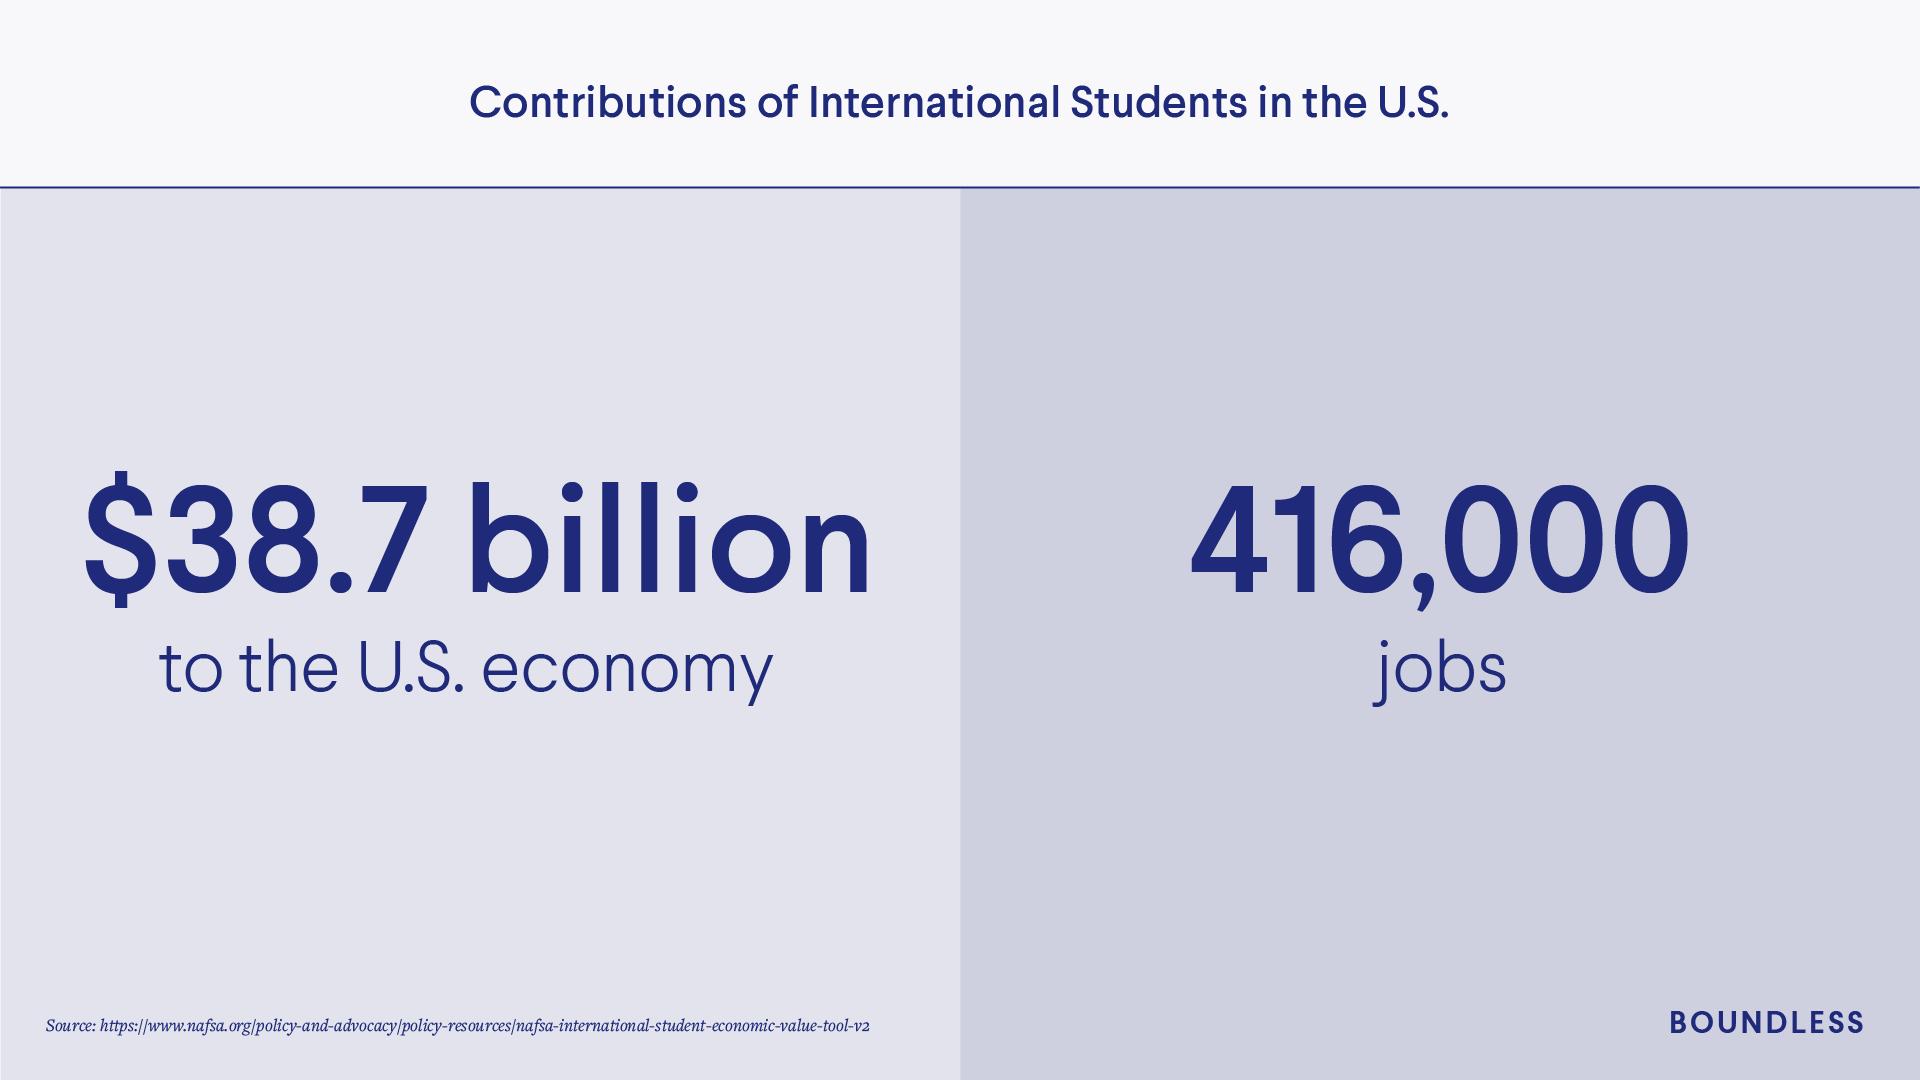 Economic contributions of international students